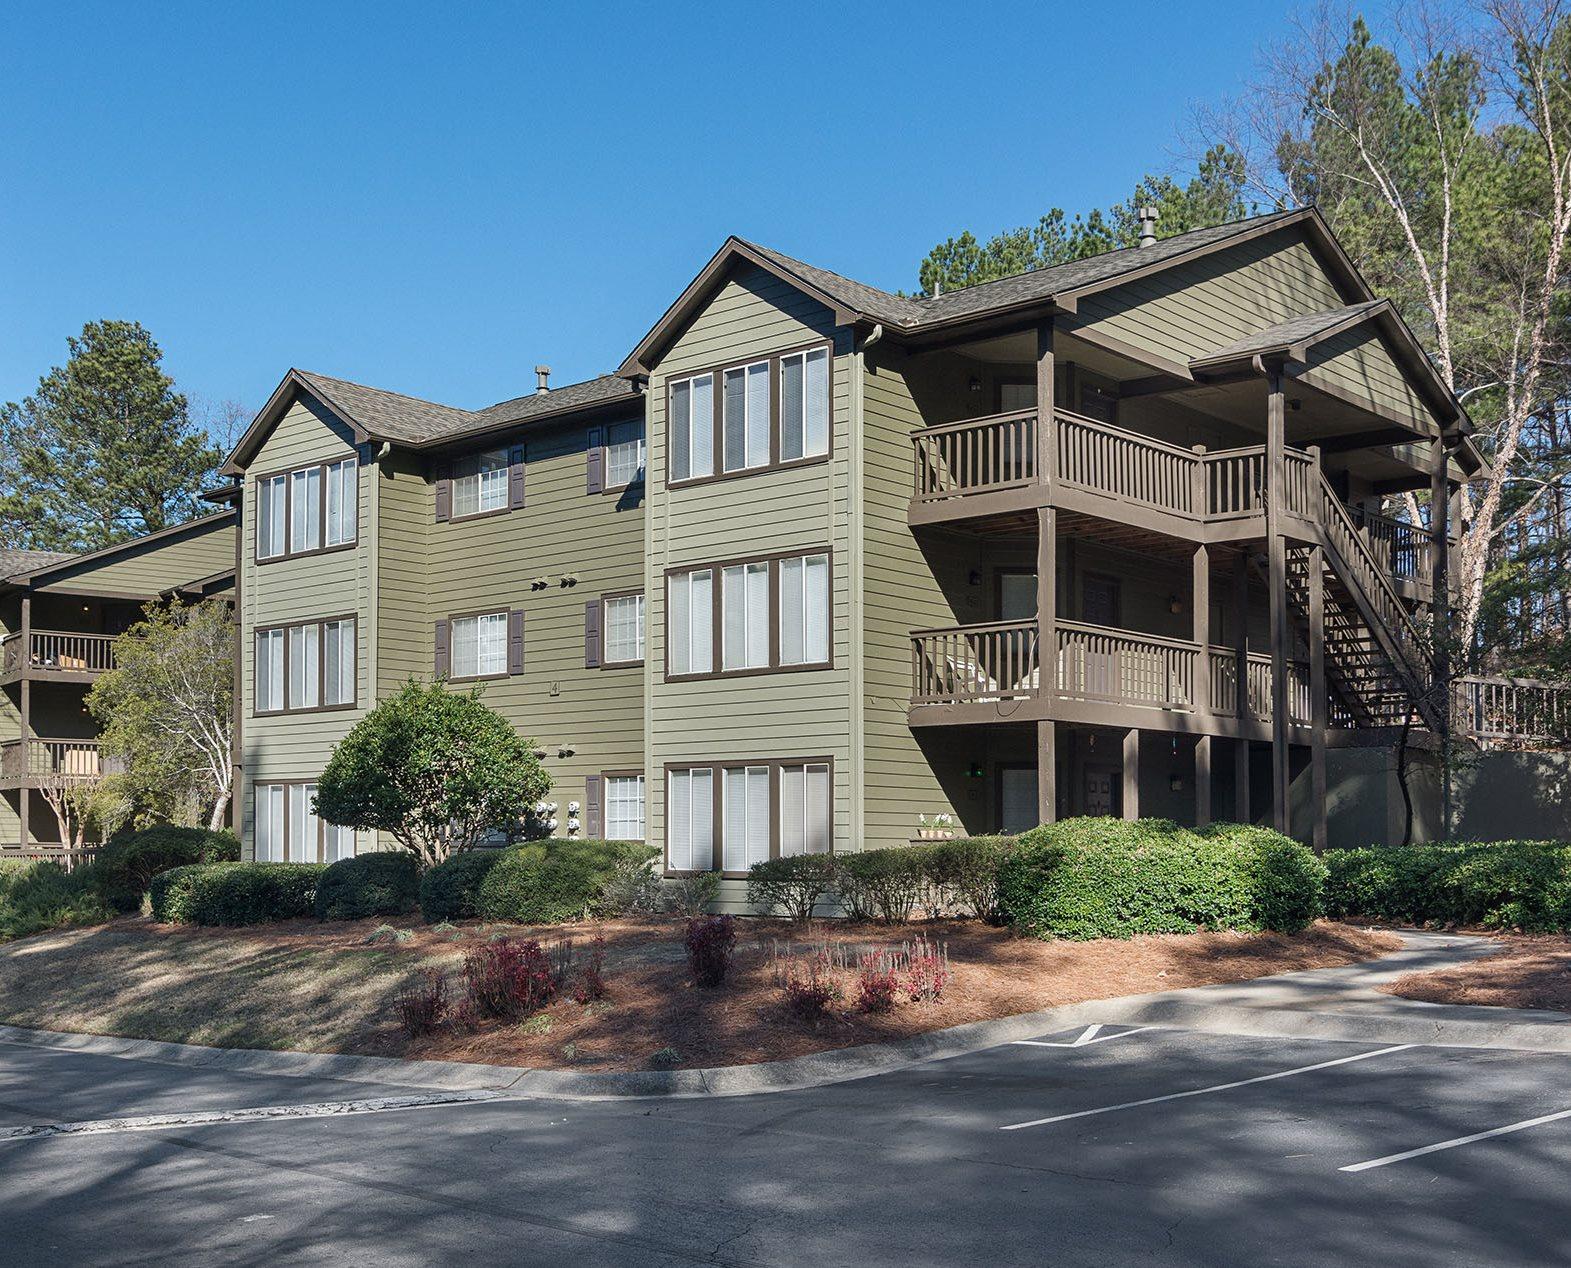 Apartment Buildings at Champions Glen Apartments in Union City, Georgia, GA 30291